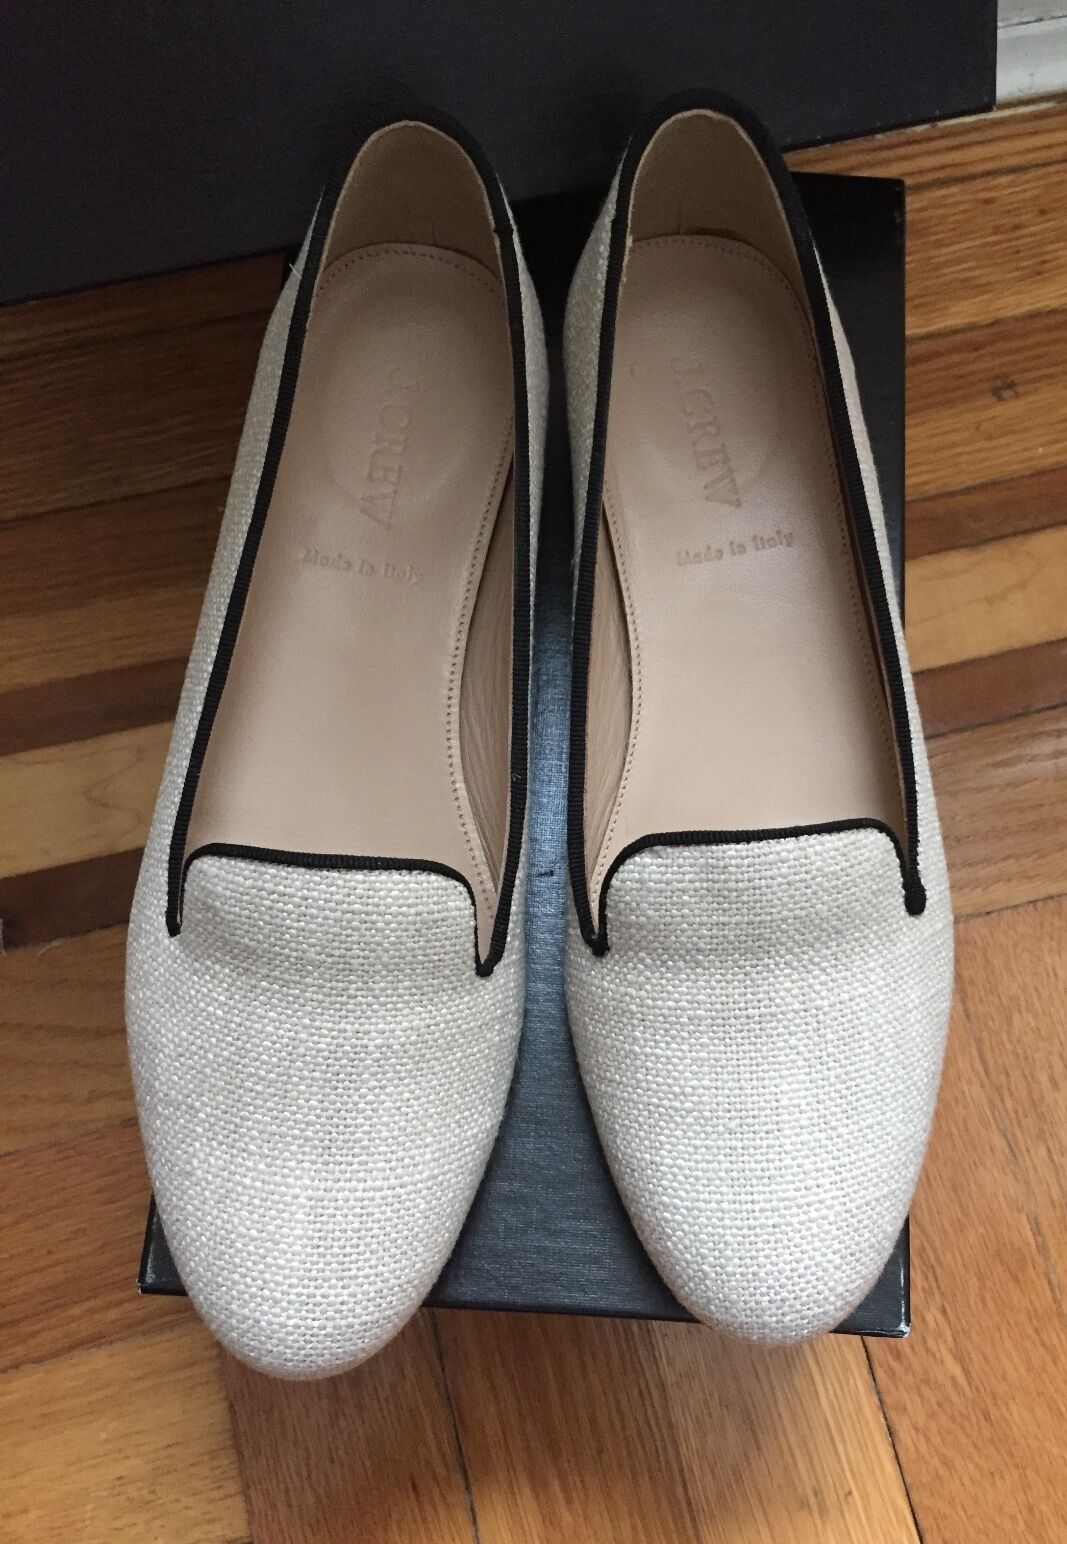 J Crew Damenschuhe Schuhes, Cleo Canvas Loafers, Vanila Farbe, Größe 7 (one time worn)